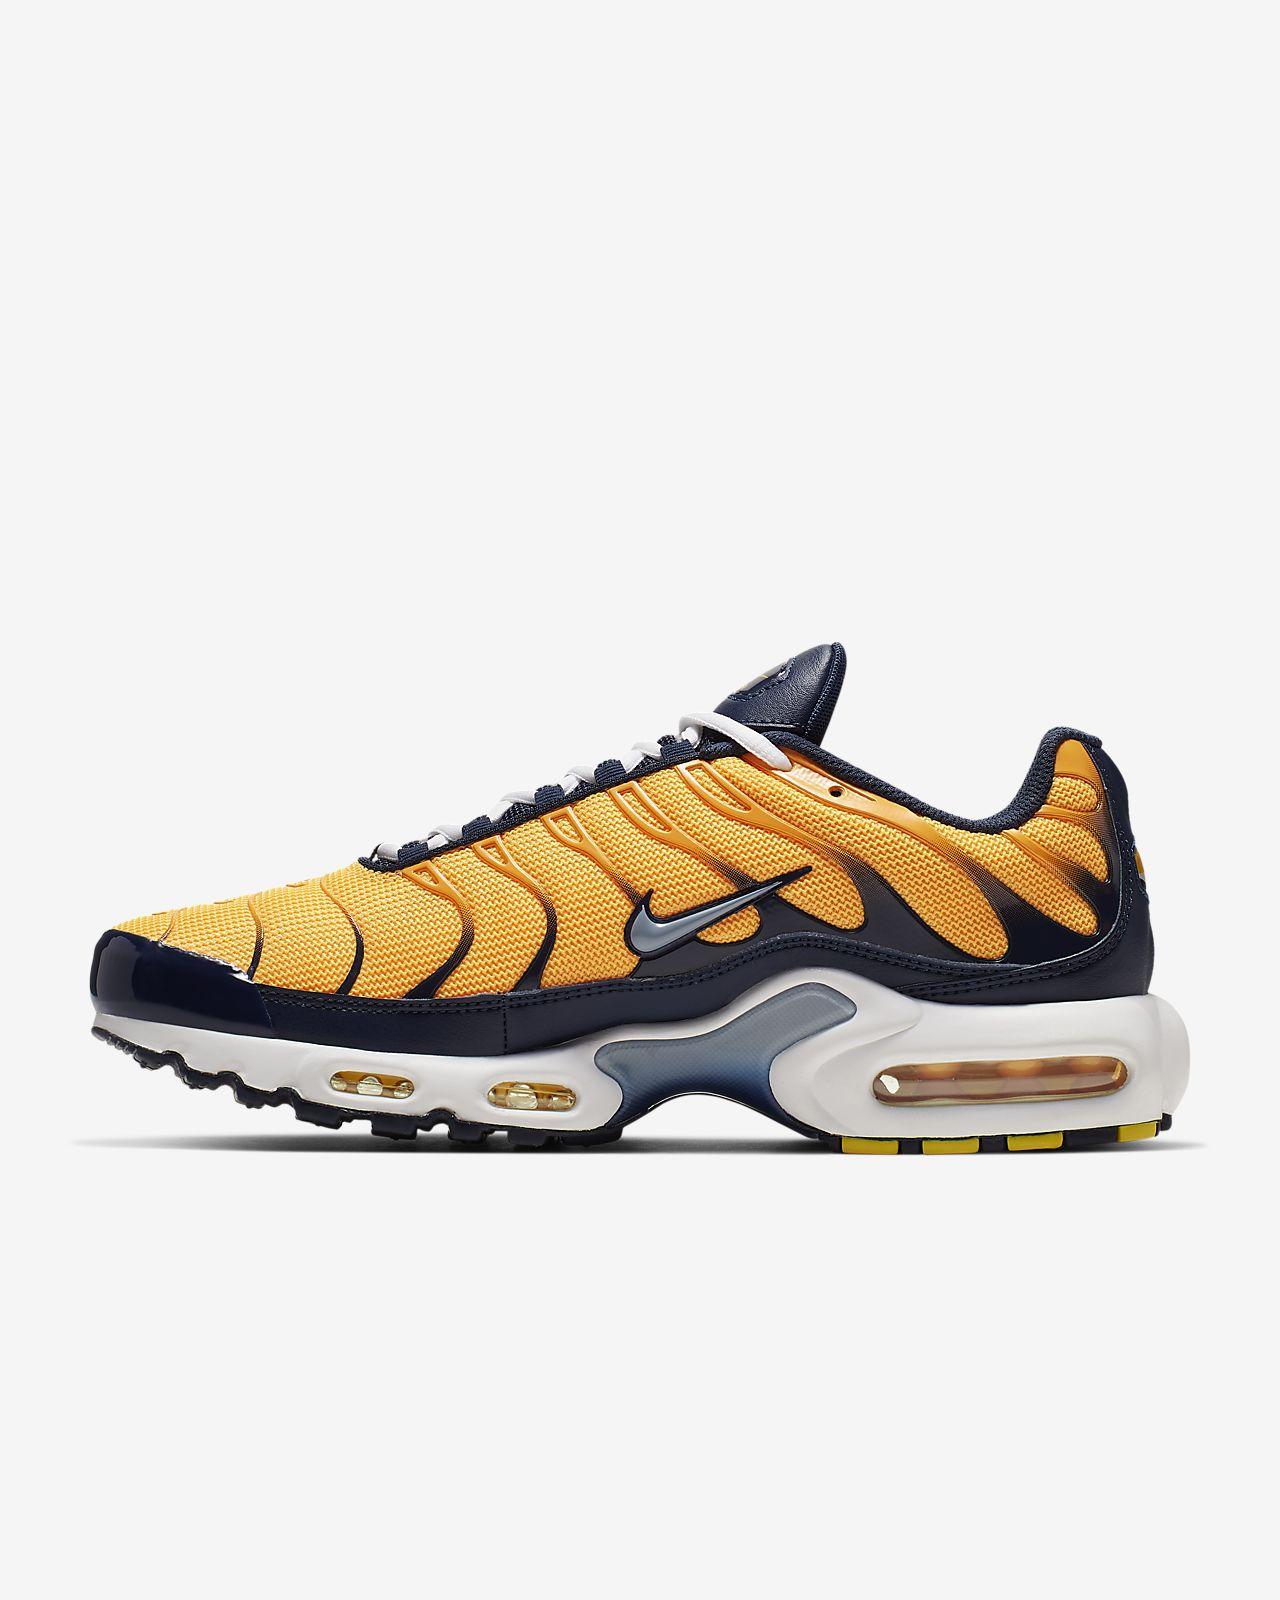 timeless design 5b30e 31da7 Nike Air Max Plus SE Men's Shoe